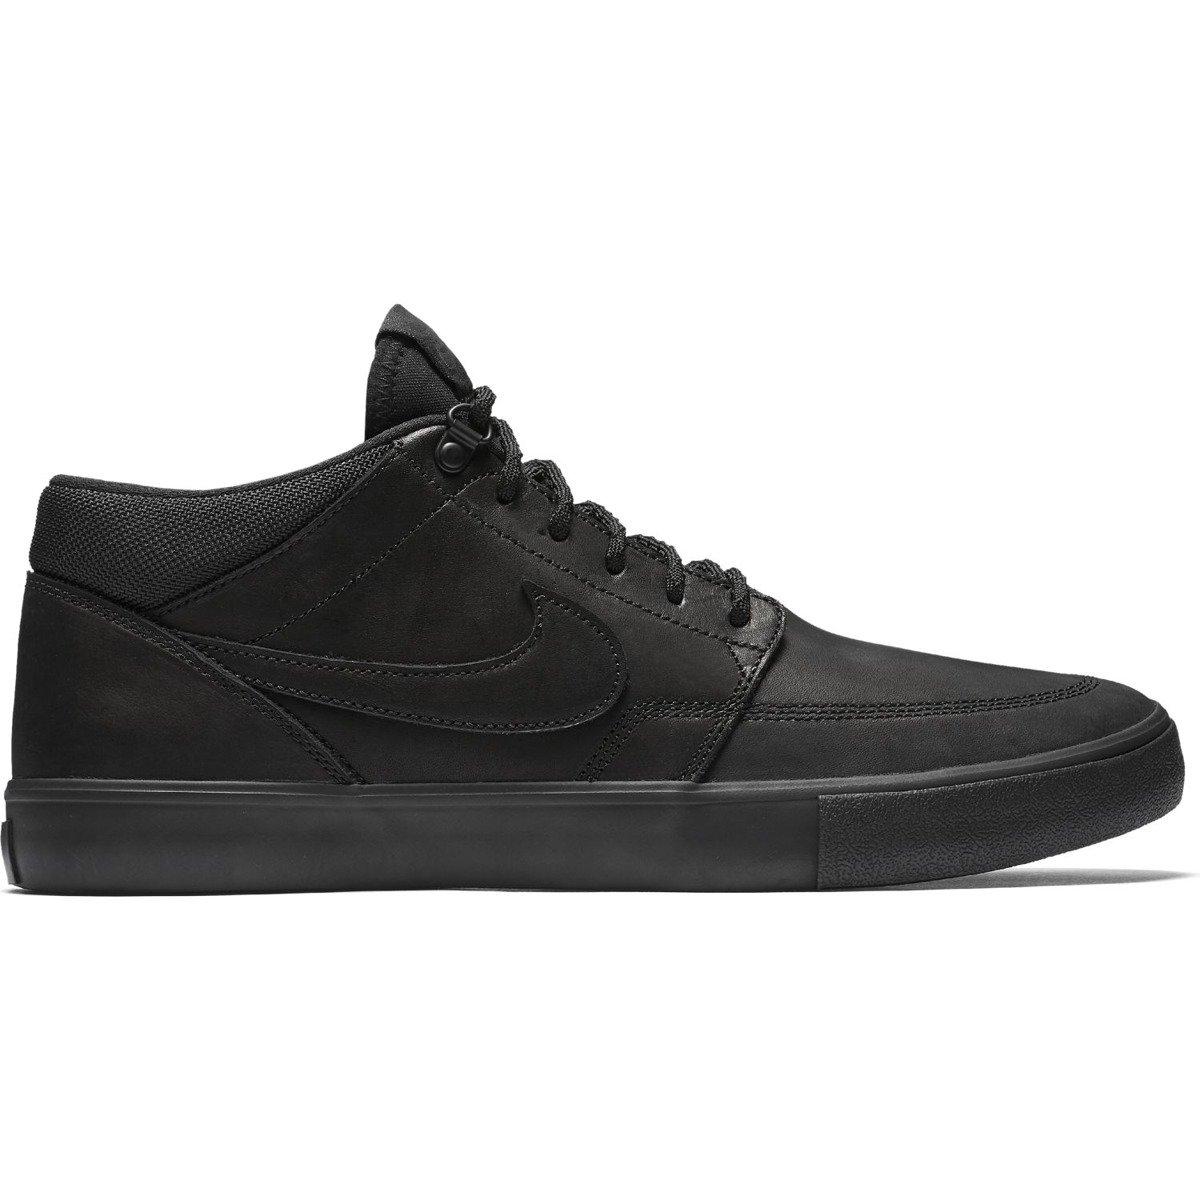 Miniramp Skateshop Buty Nike Sb Portmore Ii Bota Solar Md P